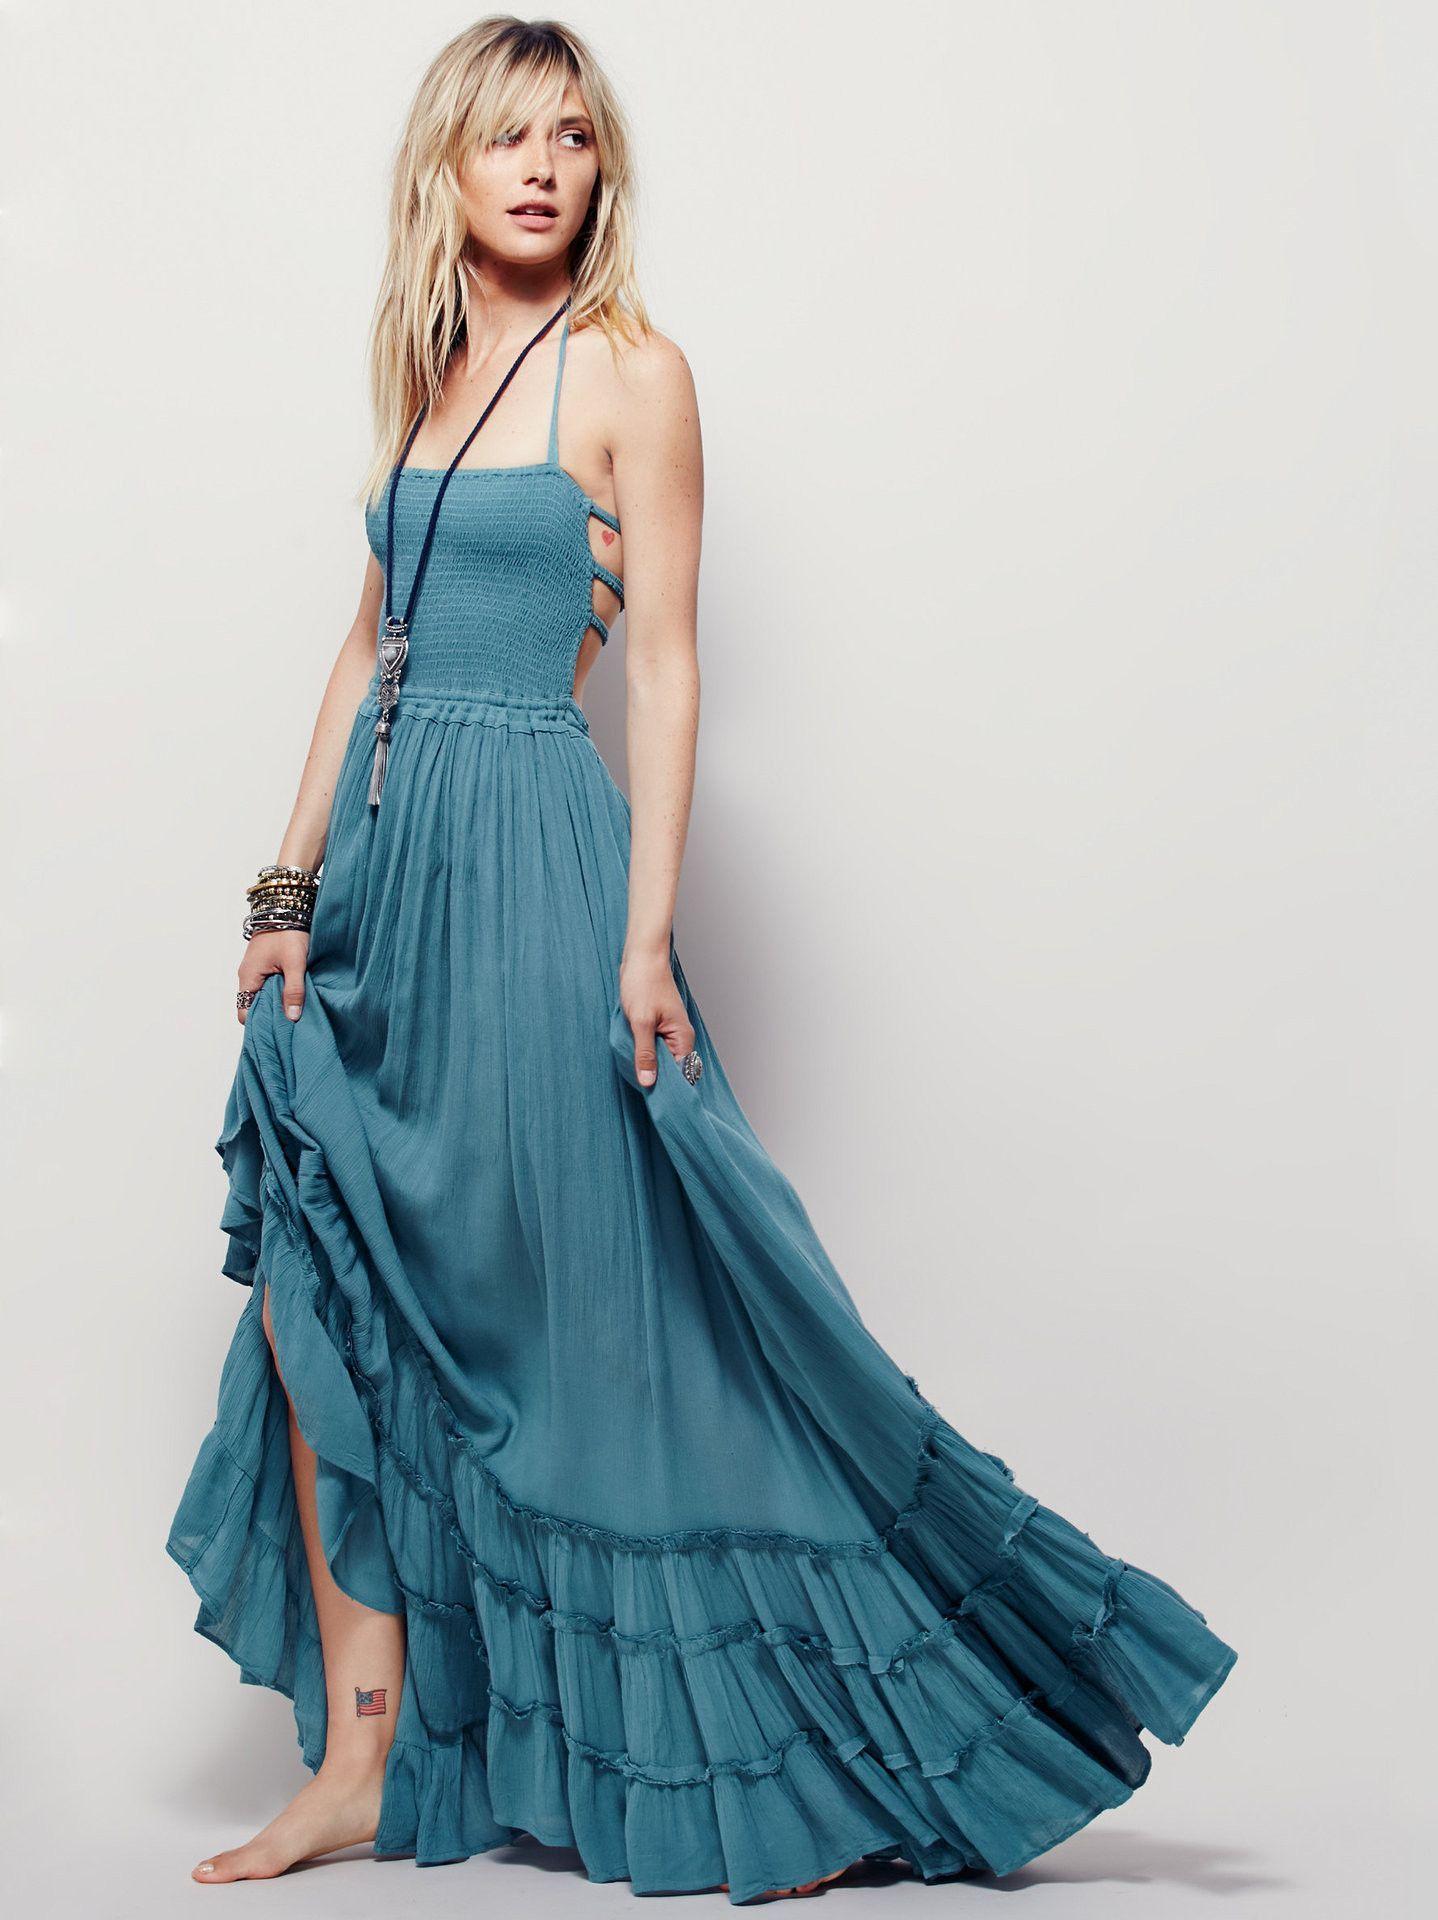 Backless Spaghetti Strap Sleeveless Long Beach Dress | Beach dresses ...